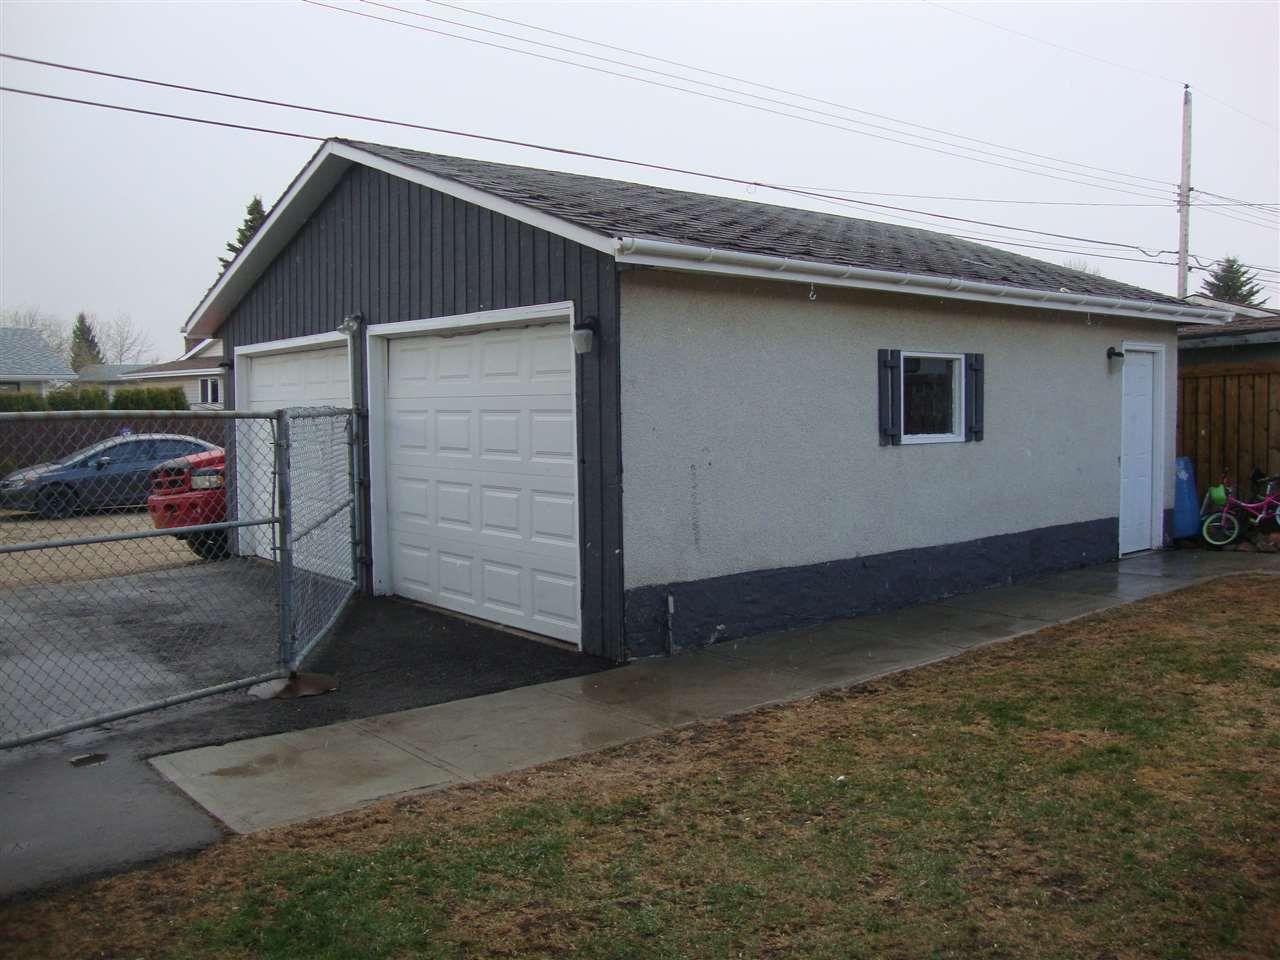 Photo 7: Photos: 4711 51A Avenue: Bon Accord House for sale : MLS®# E4149195